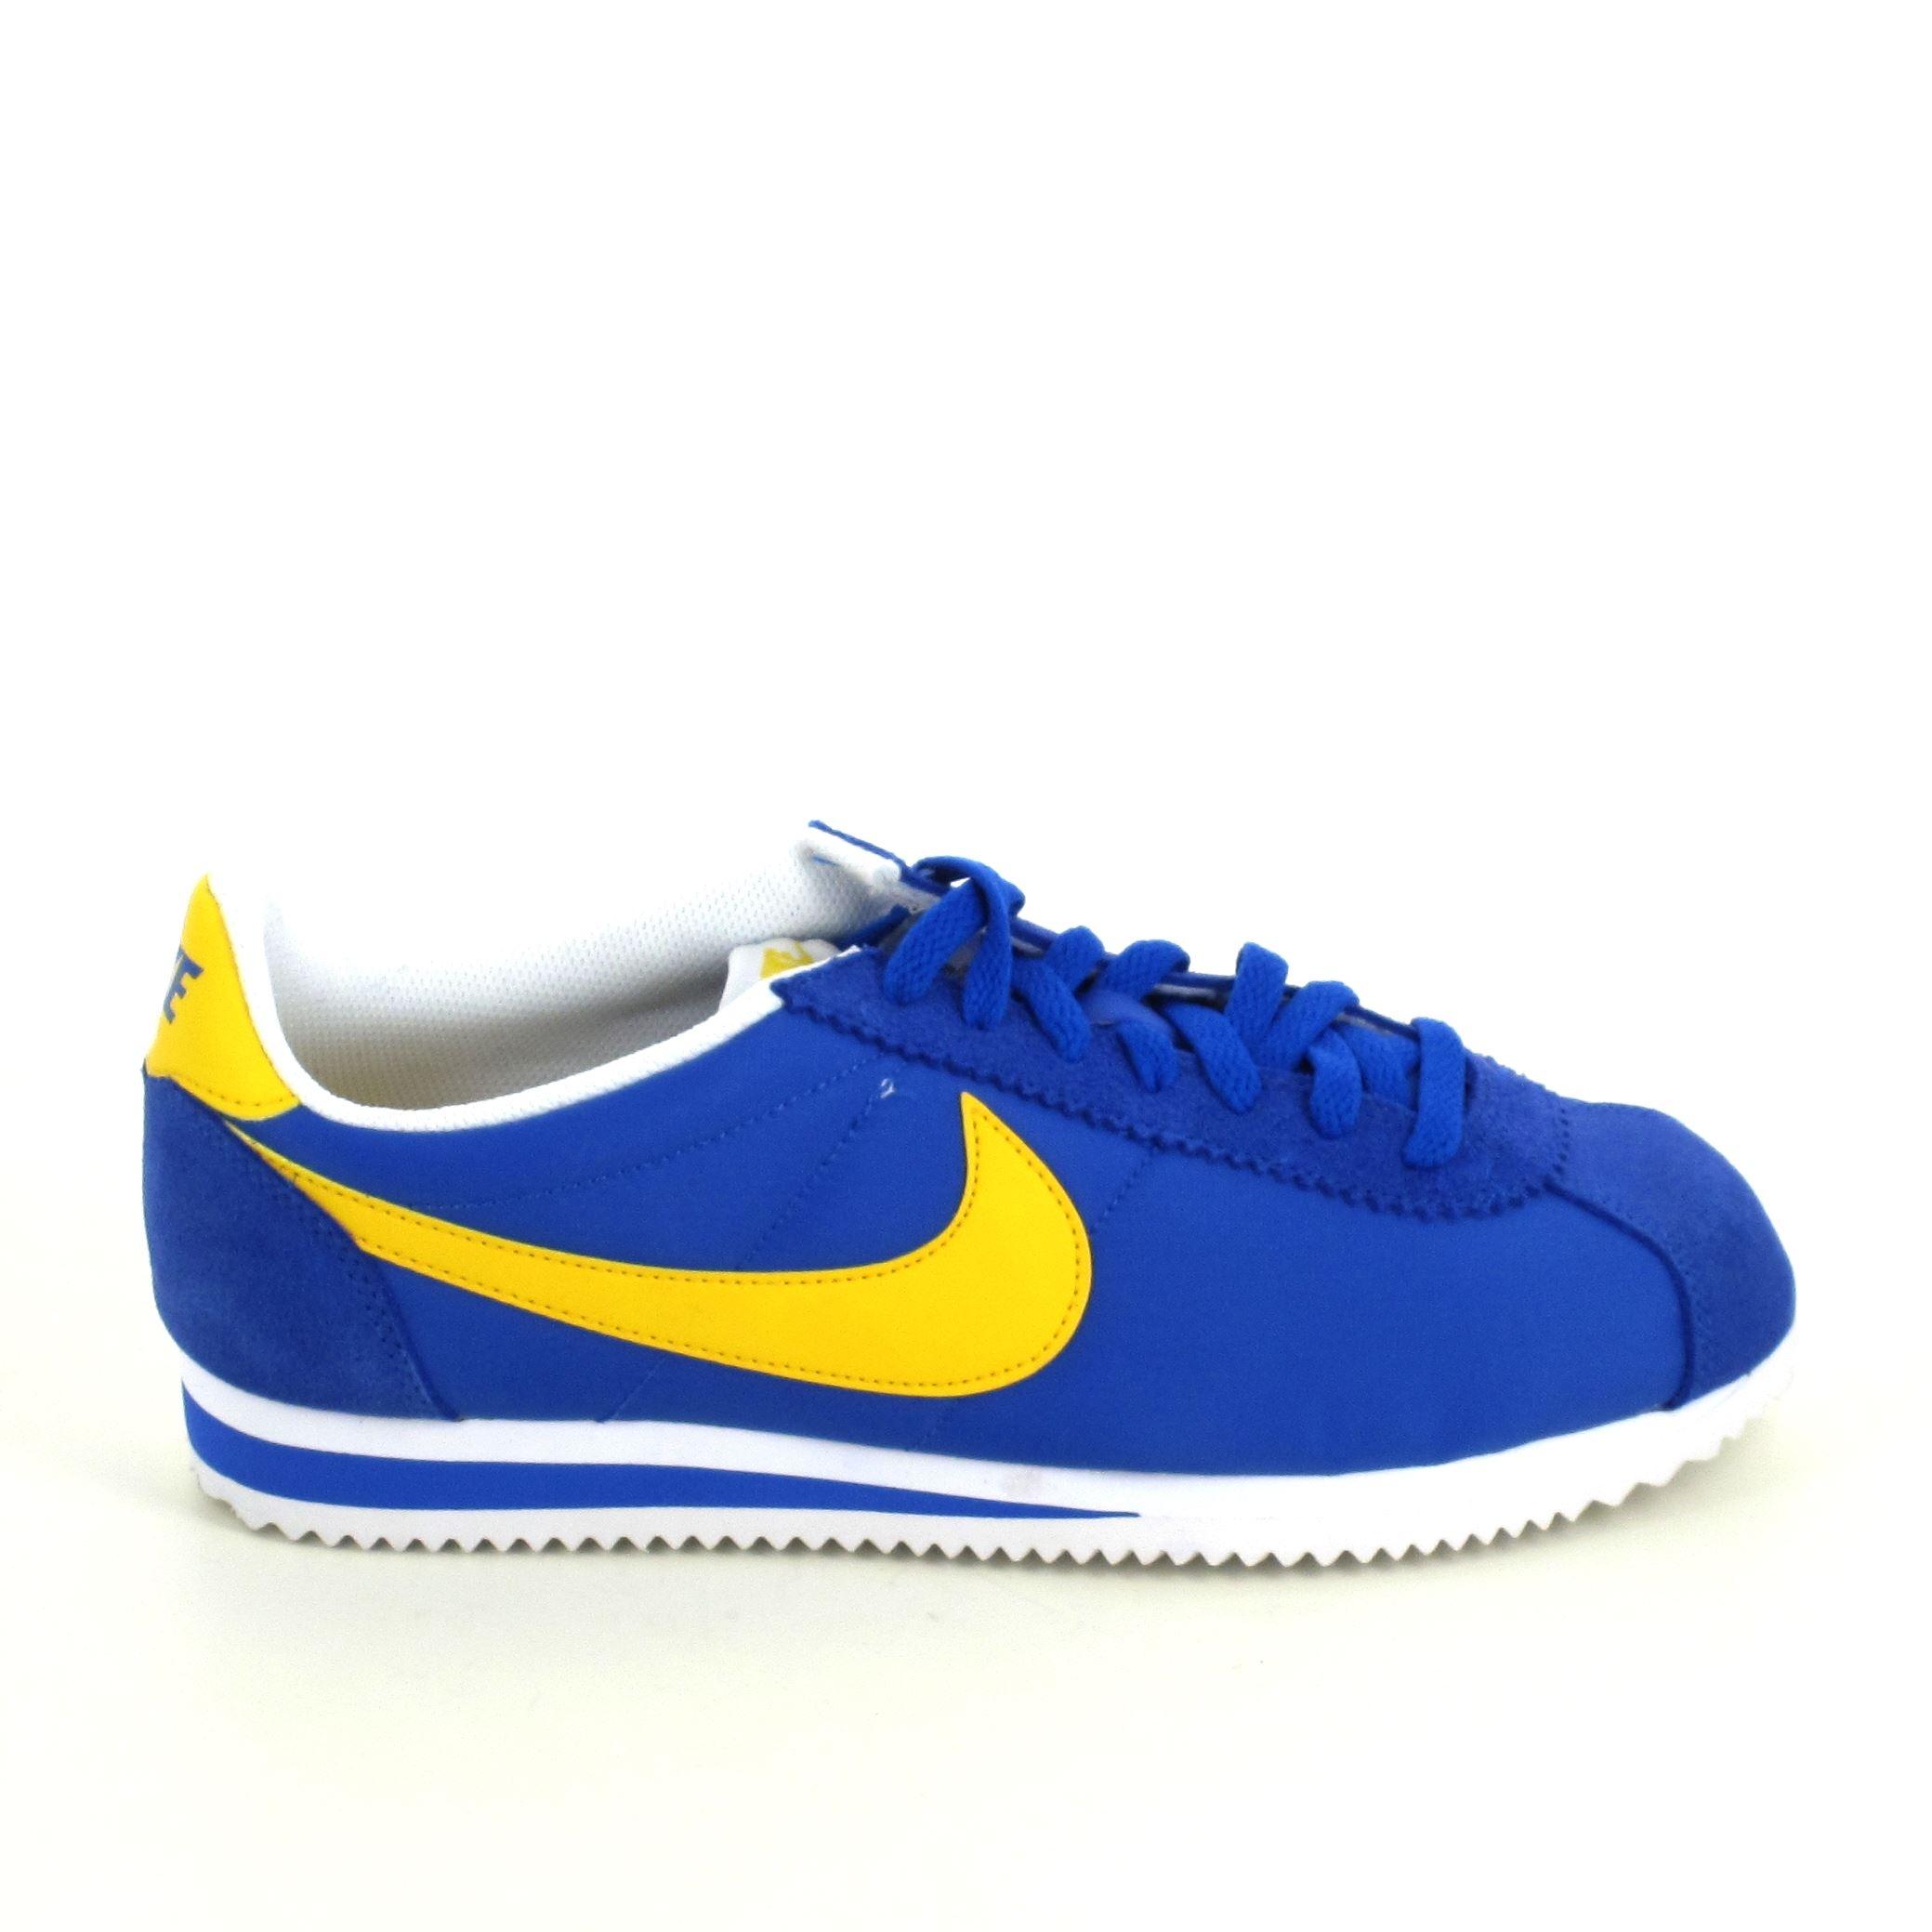 Nike Nylon Bleu Classic Cortez Jaune Sneakers OZiuXTPk